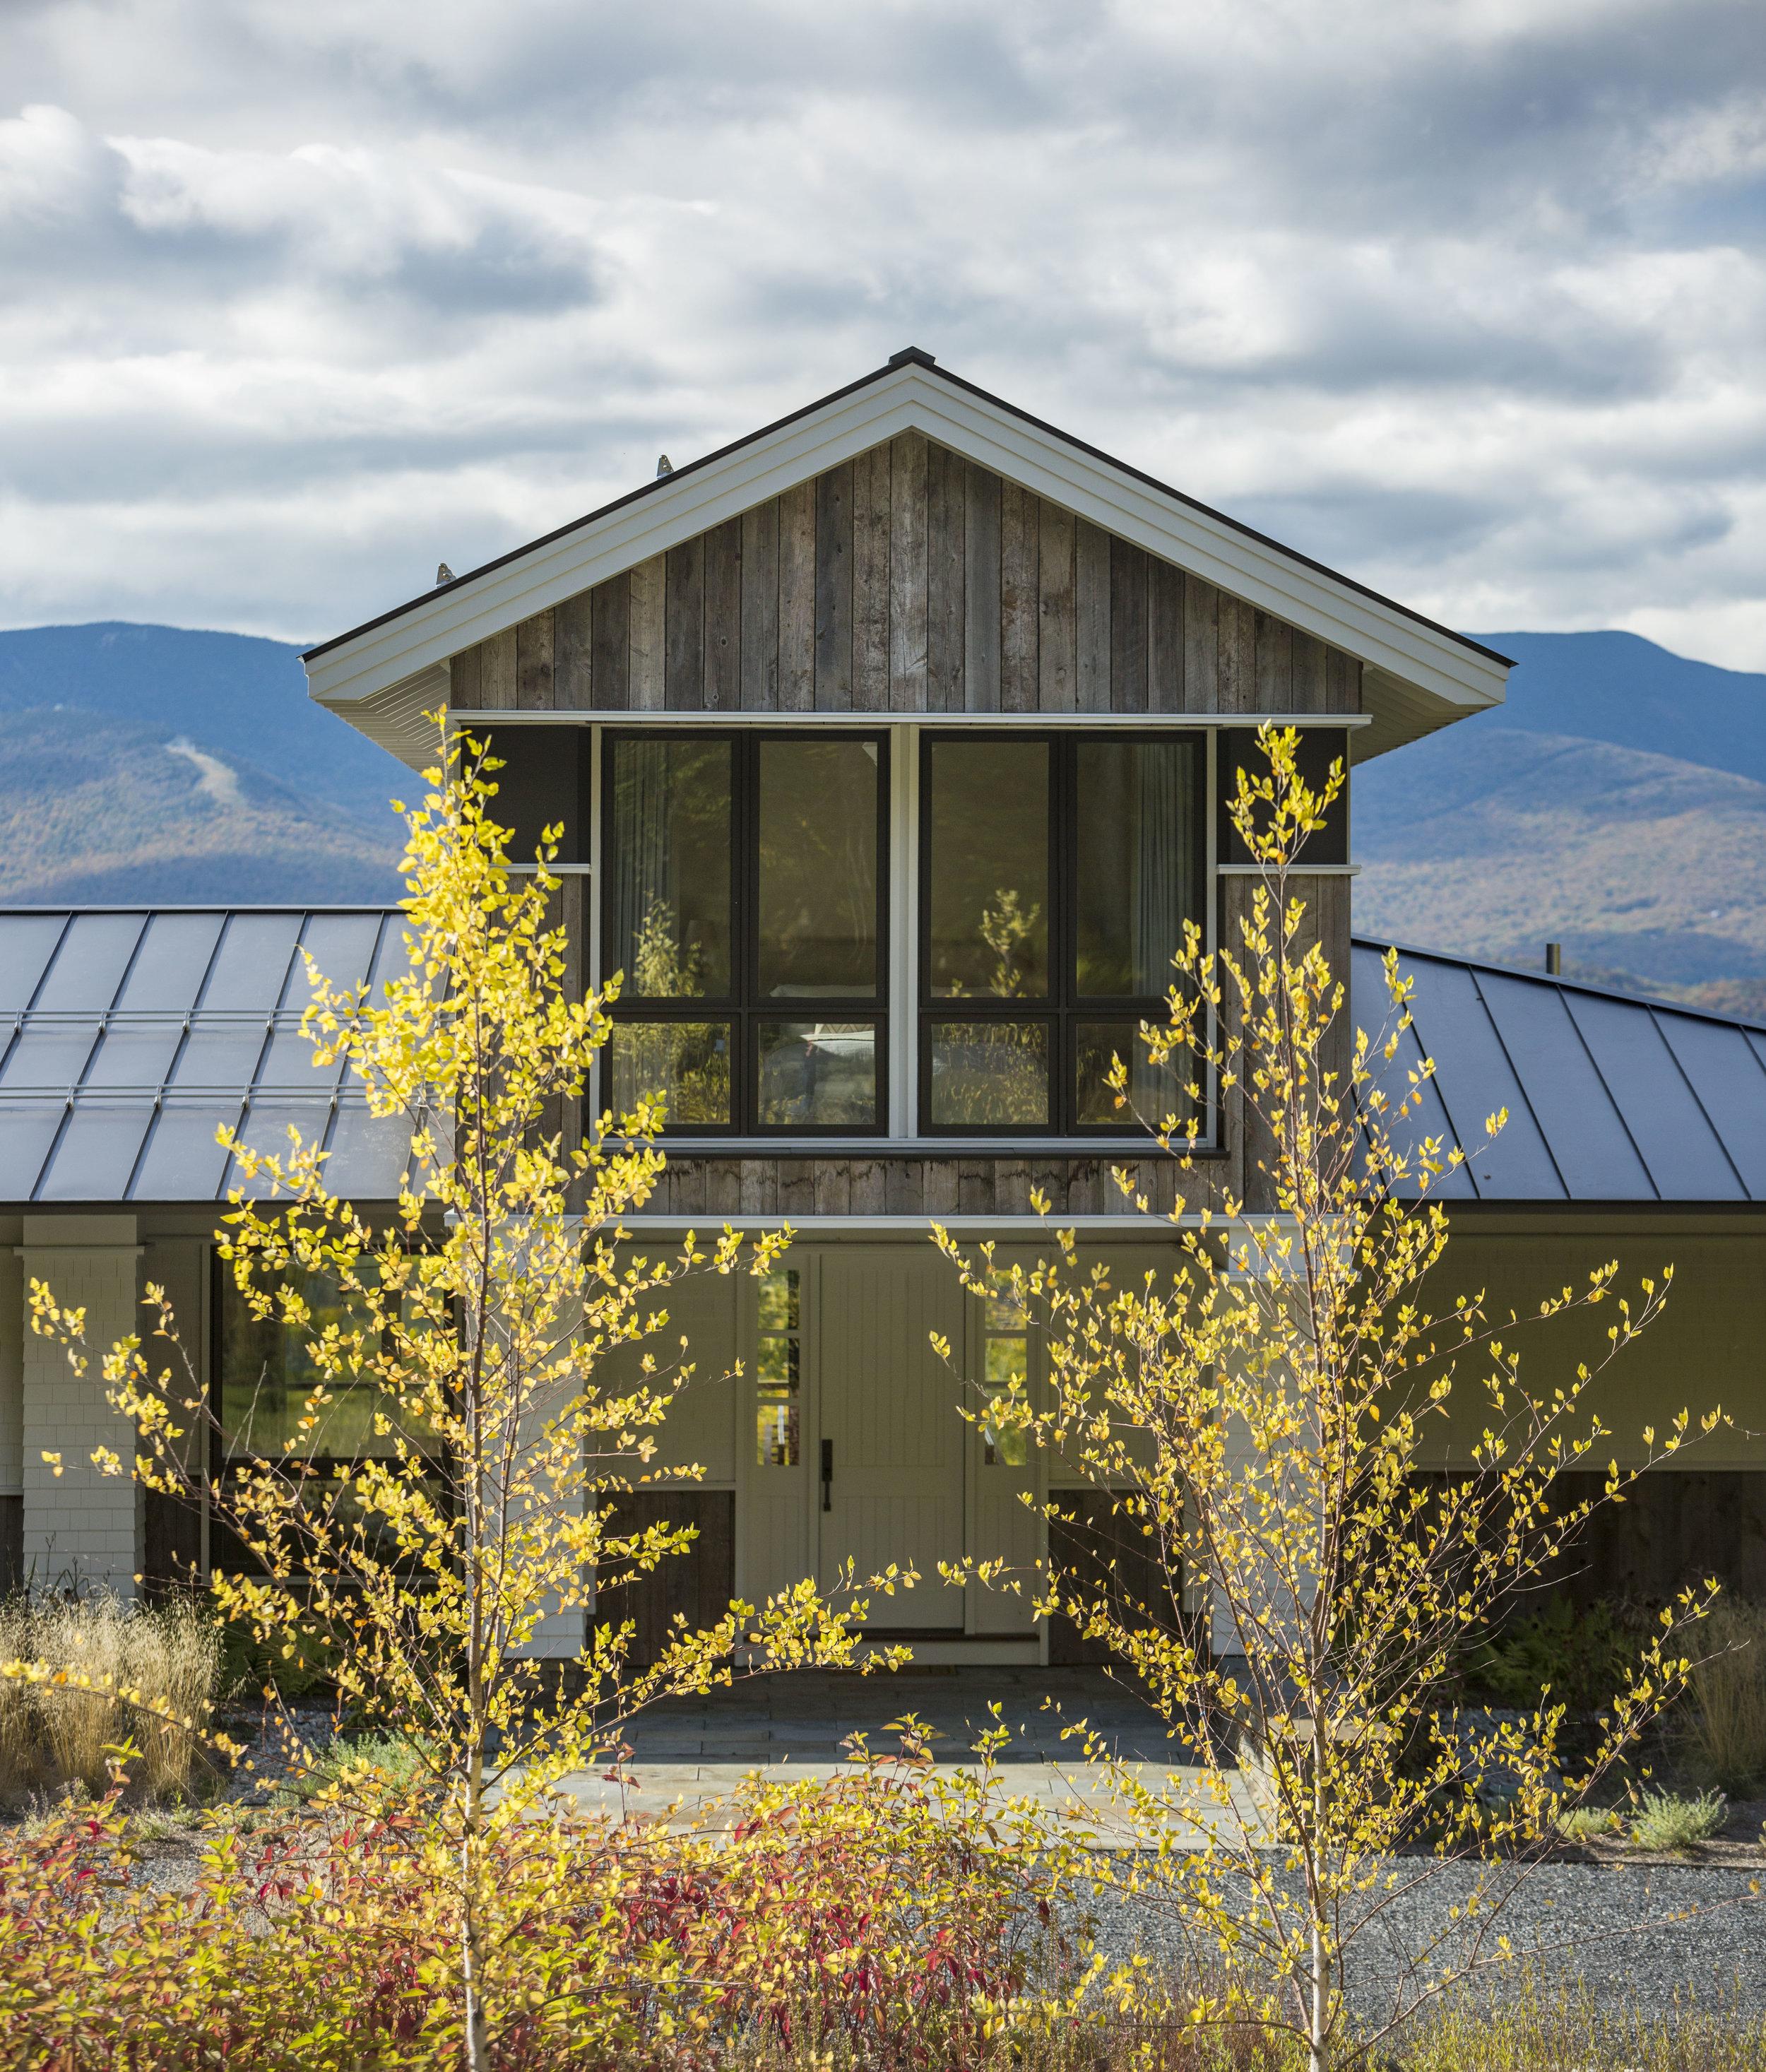 Modern Vermont Ski House Built By Bill Taylor. Architecture by Birdseye. Photographed by Jim Westphalen.